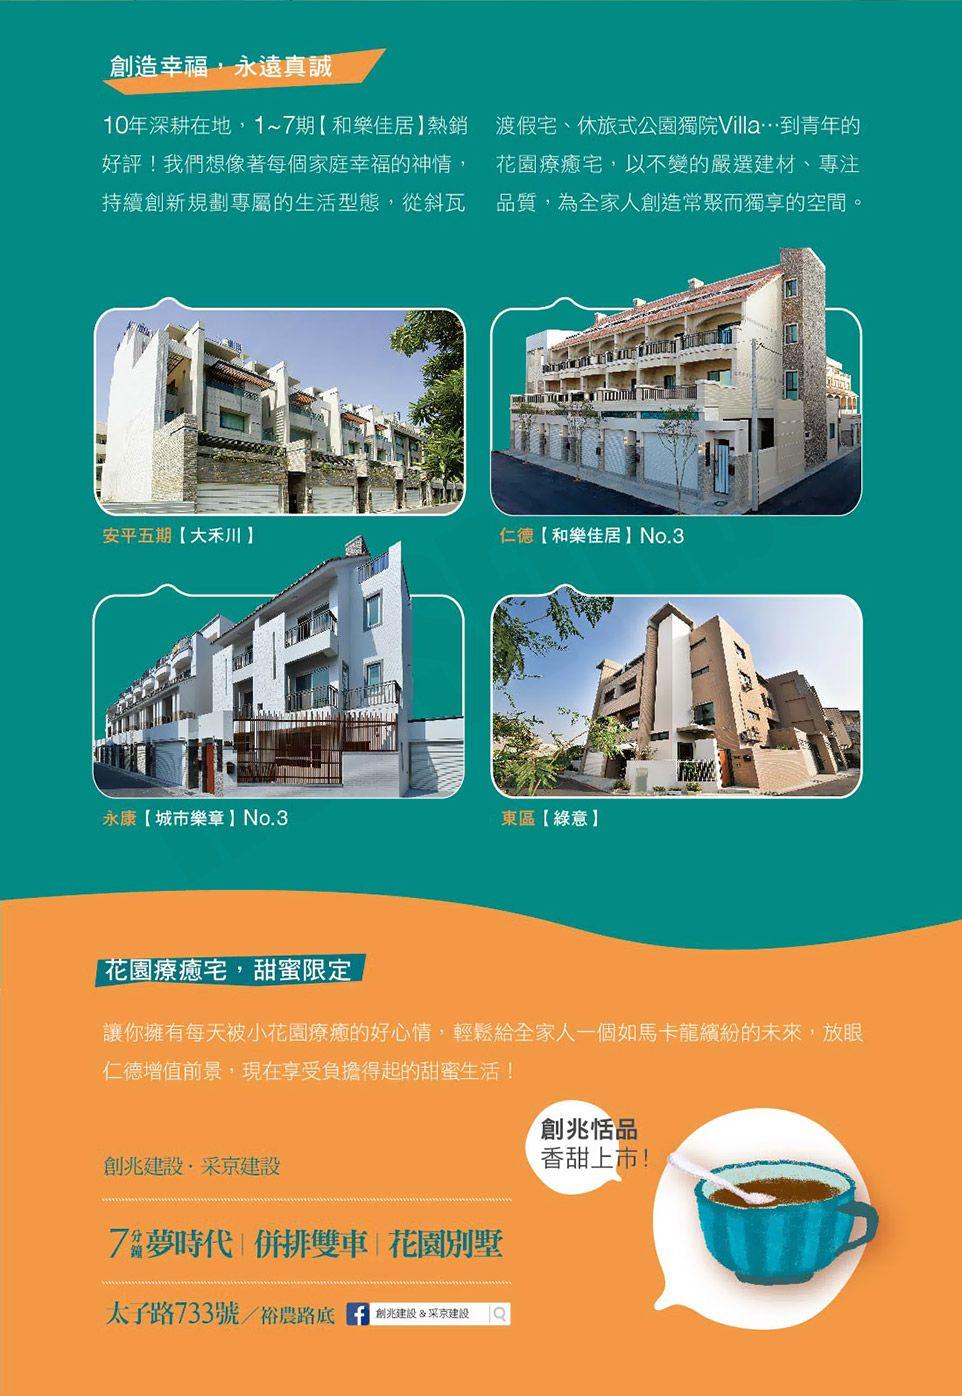 臺南房地王 | 創兆恬品 | Construction